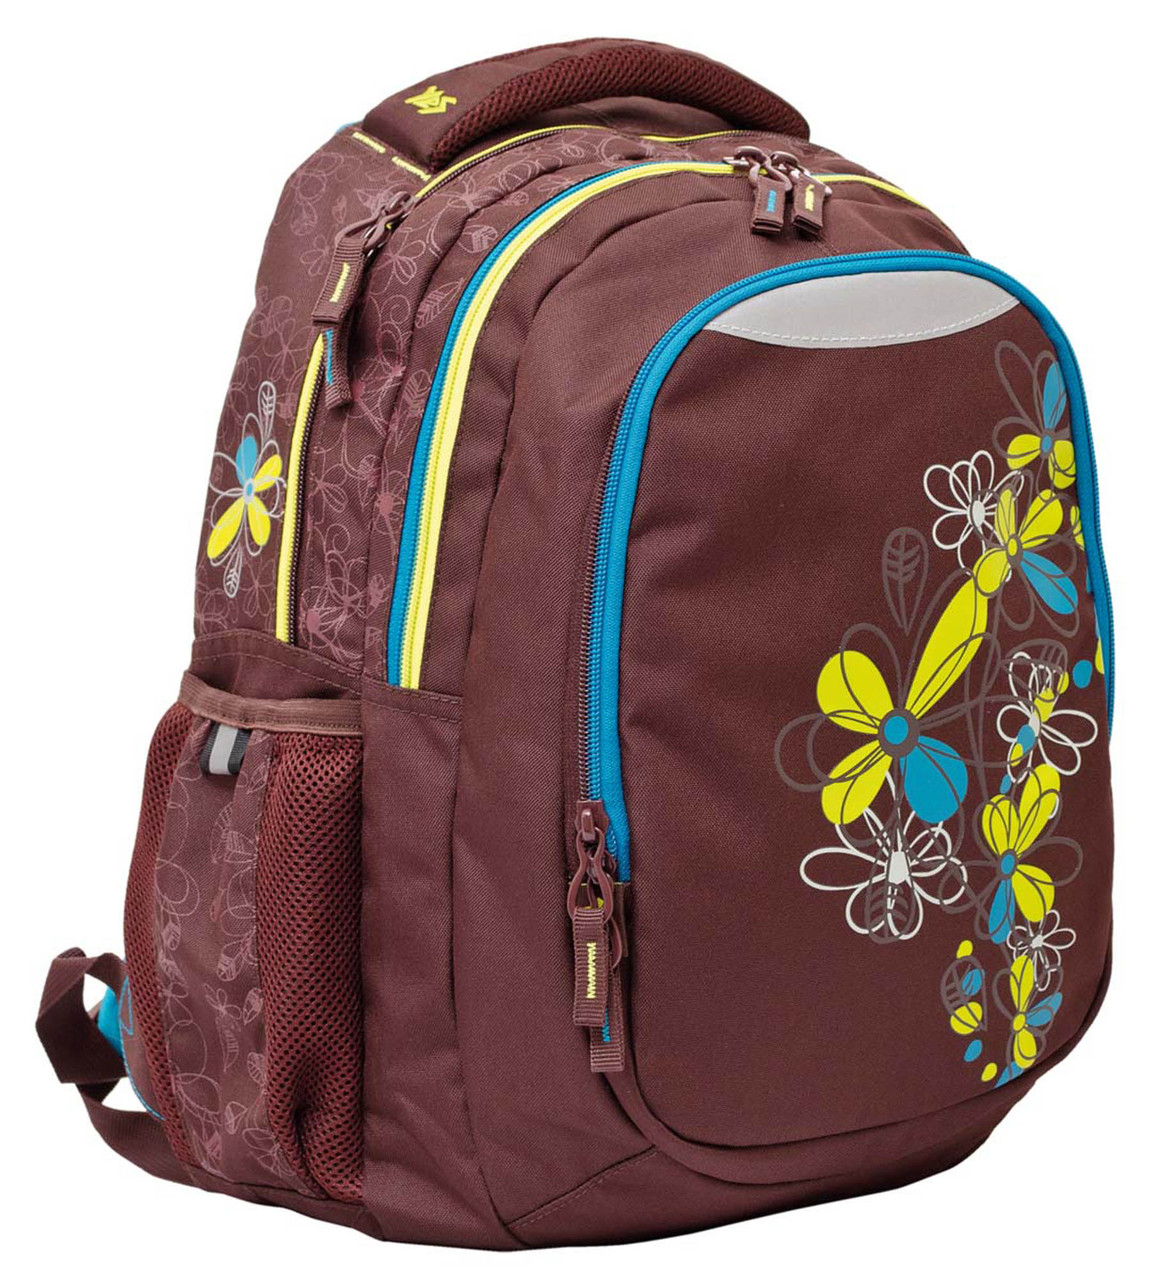 552654 Рюкзак подростковый YES Т-23 Flora 42*32*23